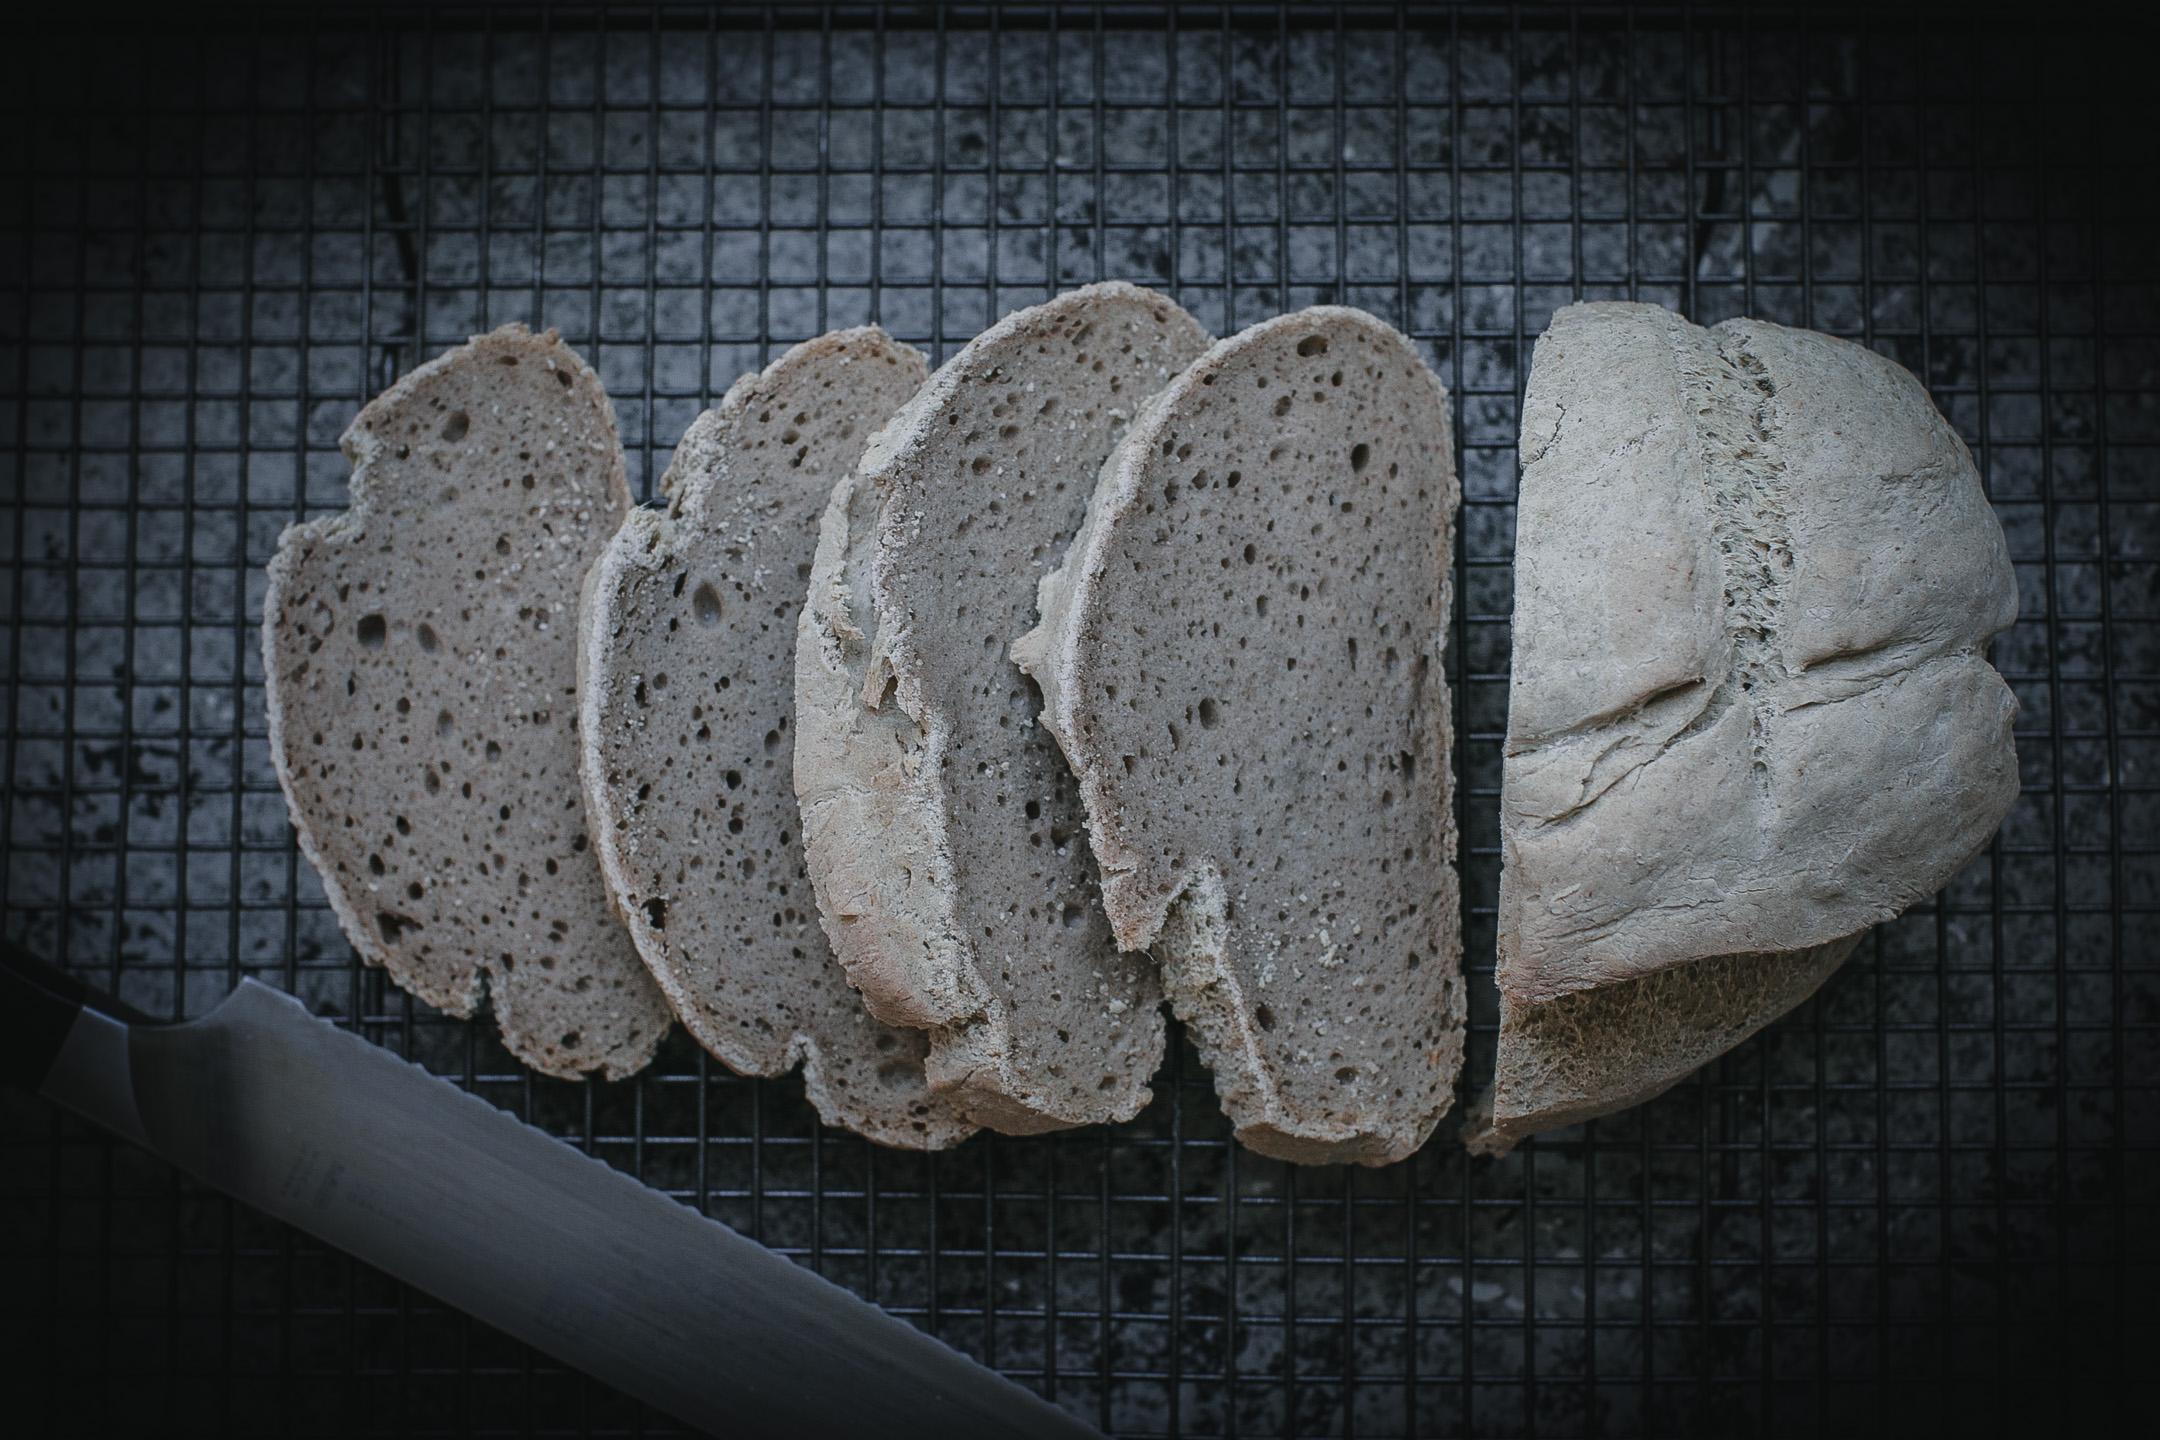 Yeast Free Gluten Free Vegan Bread Recipe Helen Tzouganatos Gluten Free Recipes